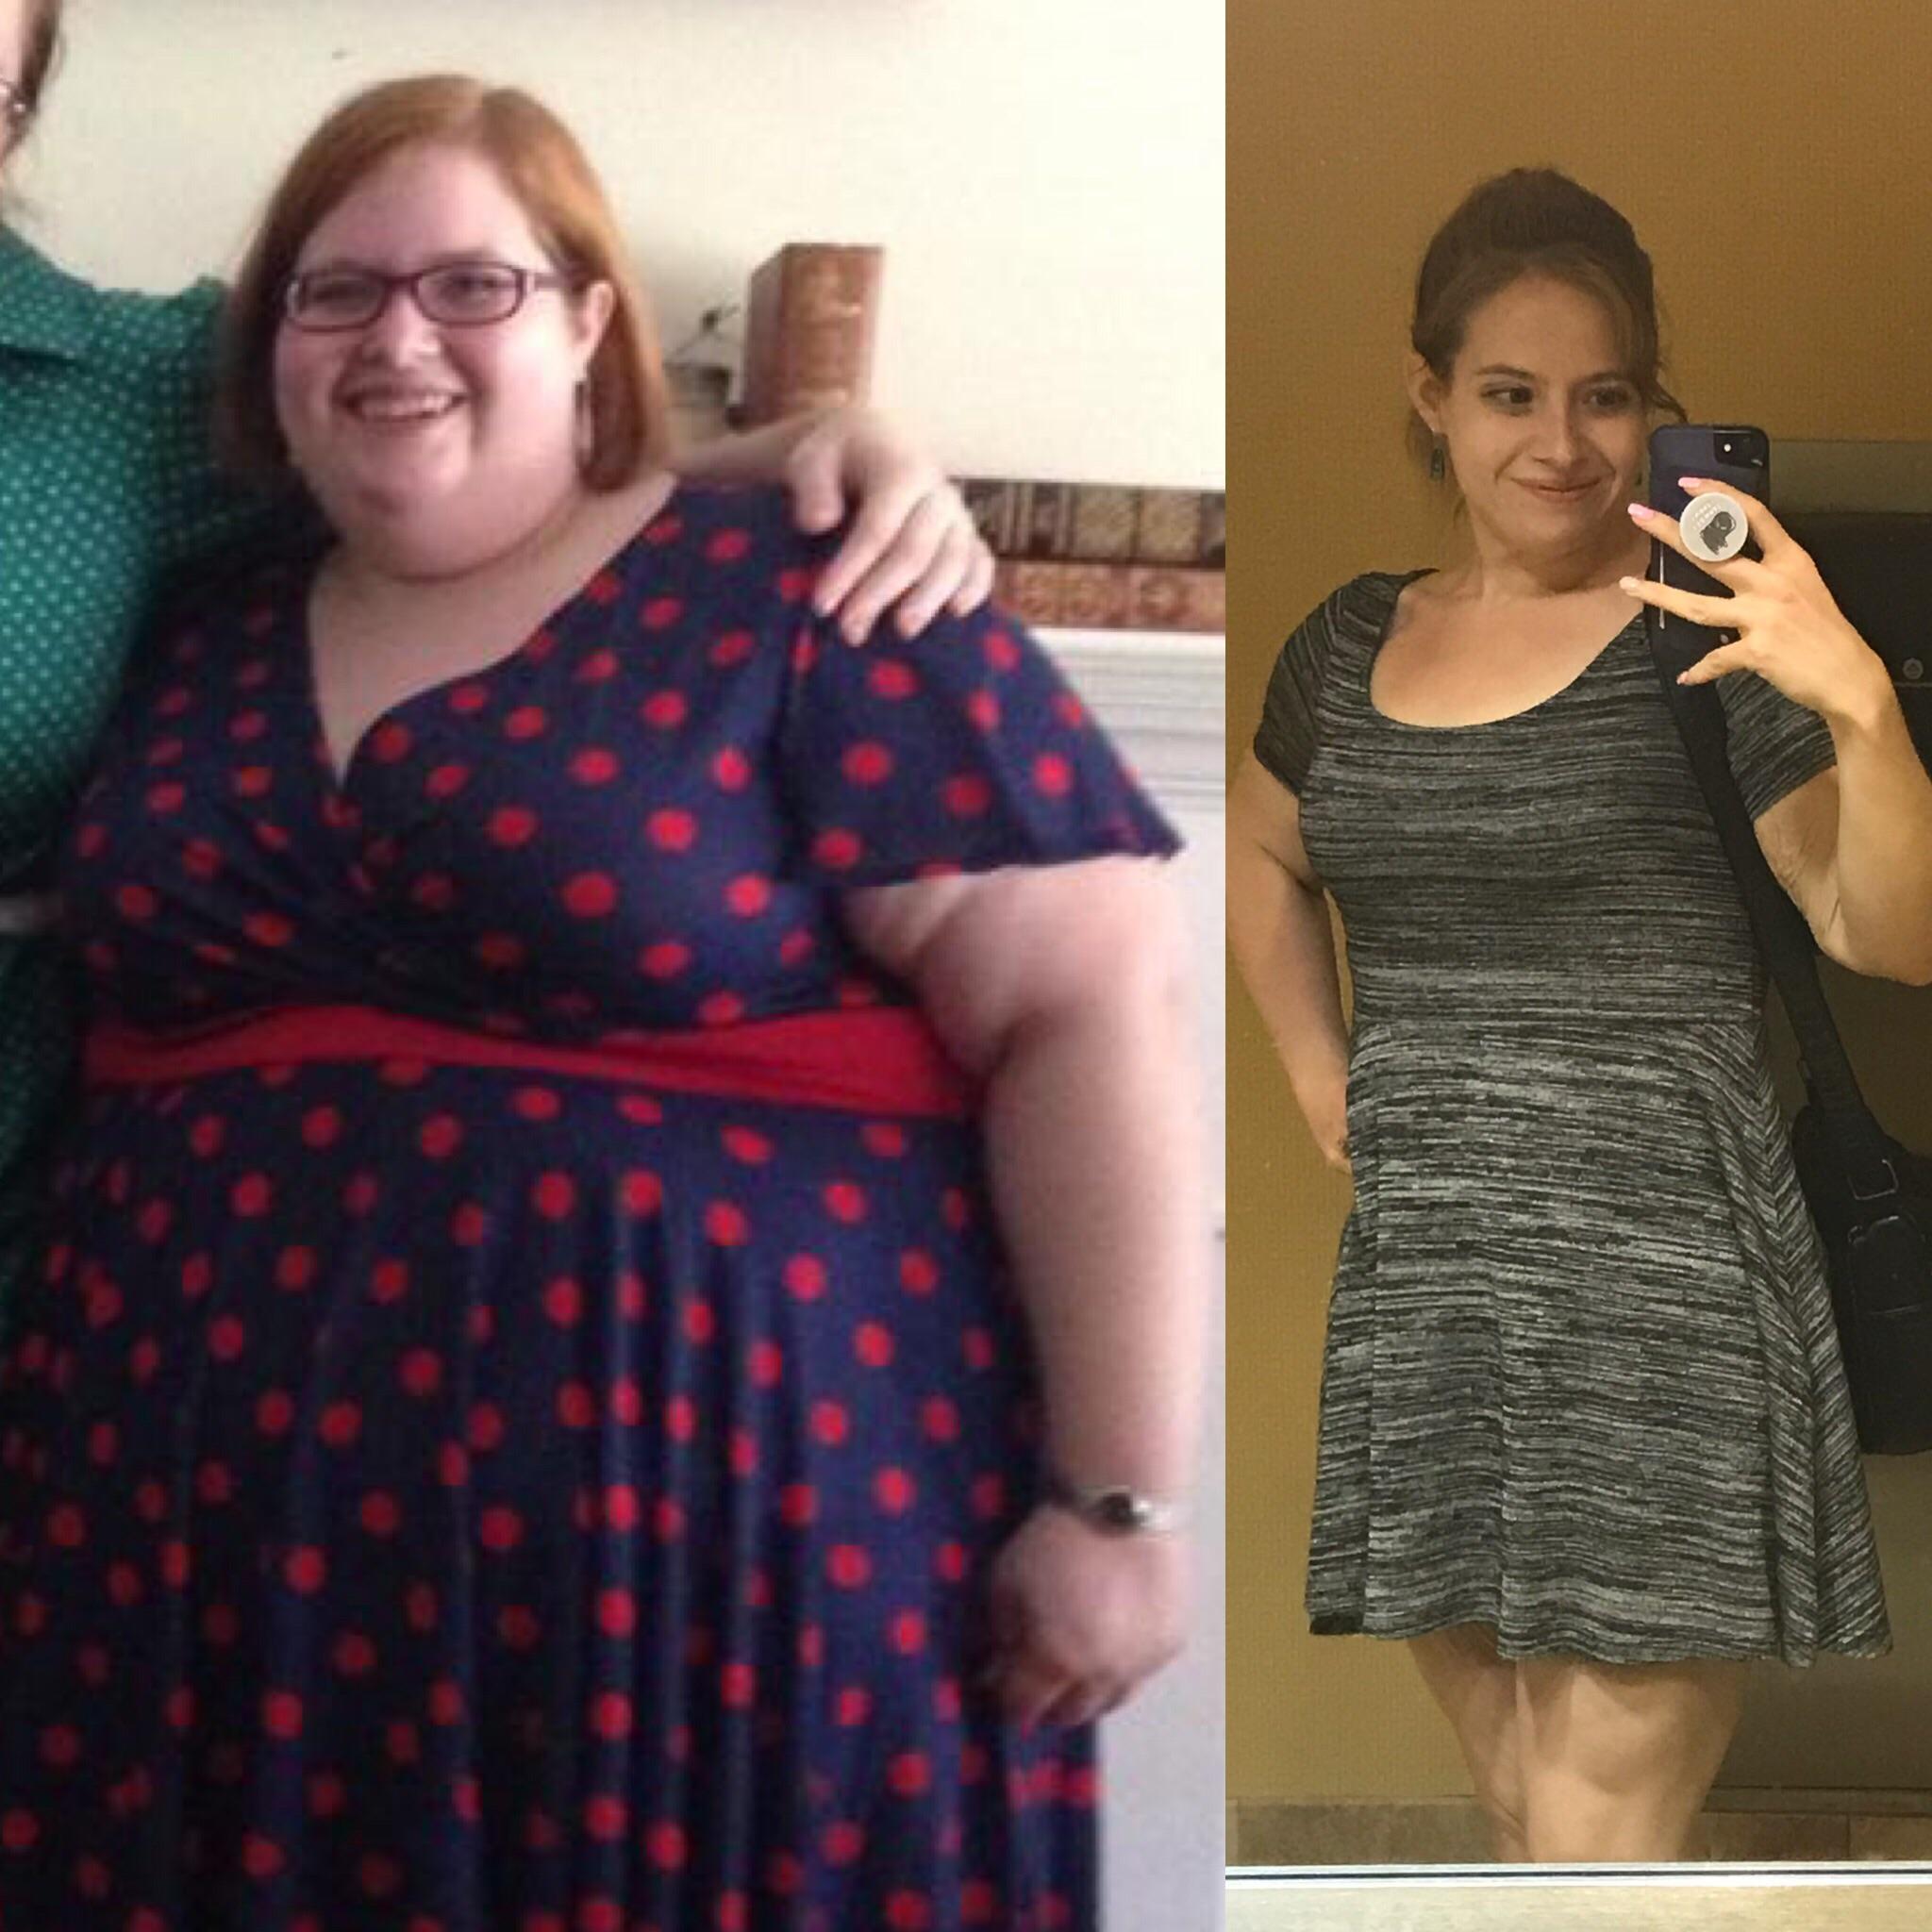 5 foot 3 Female 185 lbs Fat Loss 322 lbs to 137 lbs